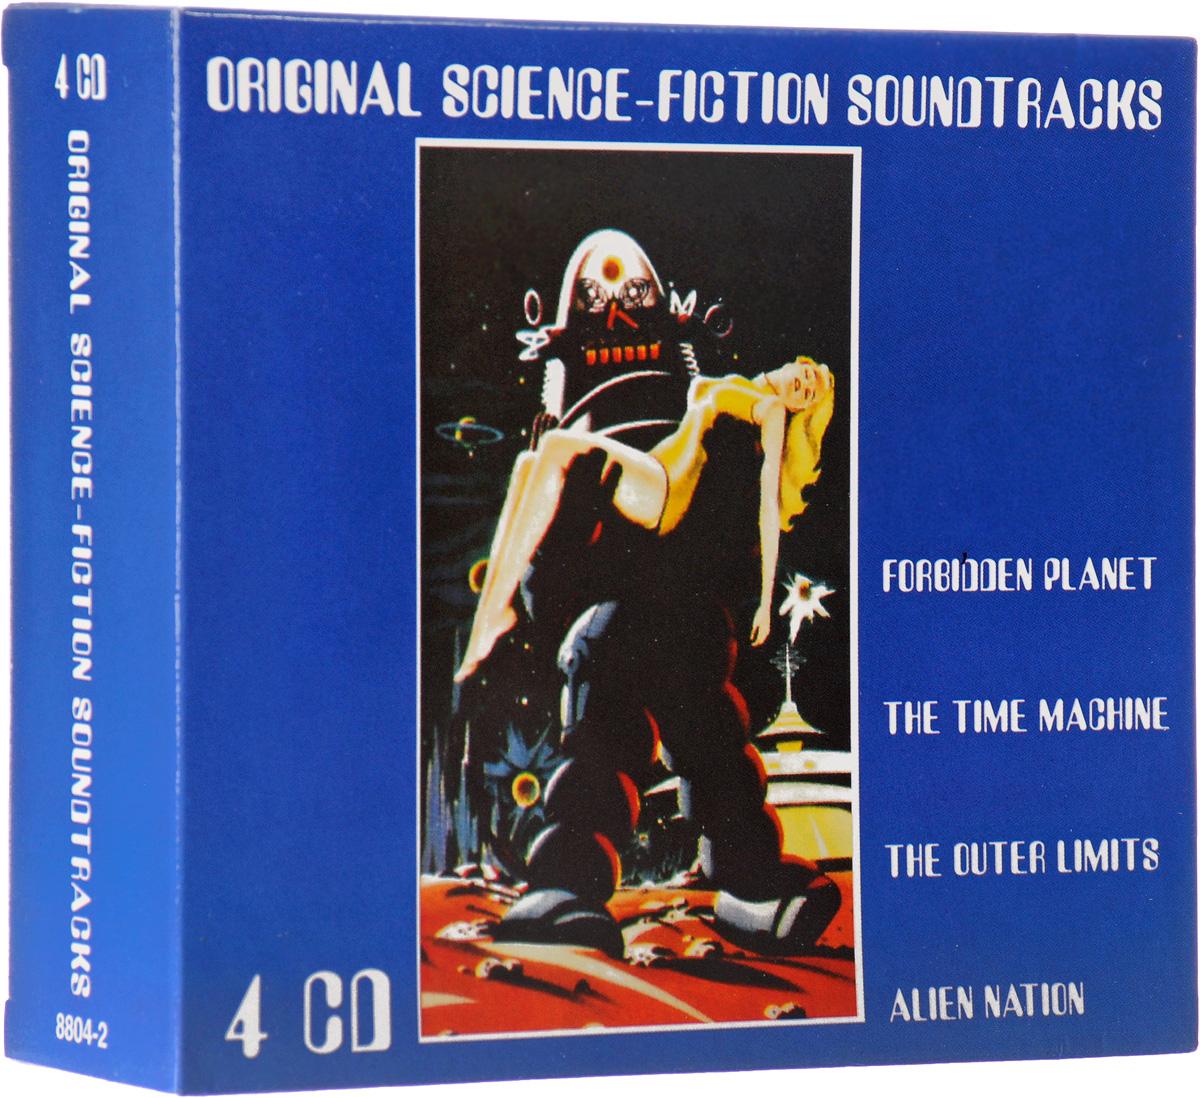 Original Science-Fiction Soundtracks (4 CD) 55 75kw inverter with transformer hall current sensor 4644x052 83